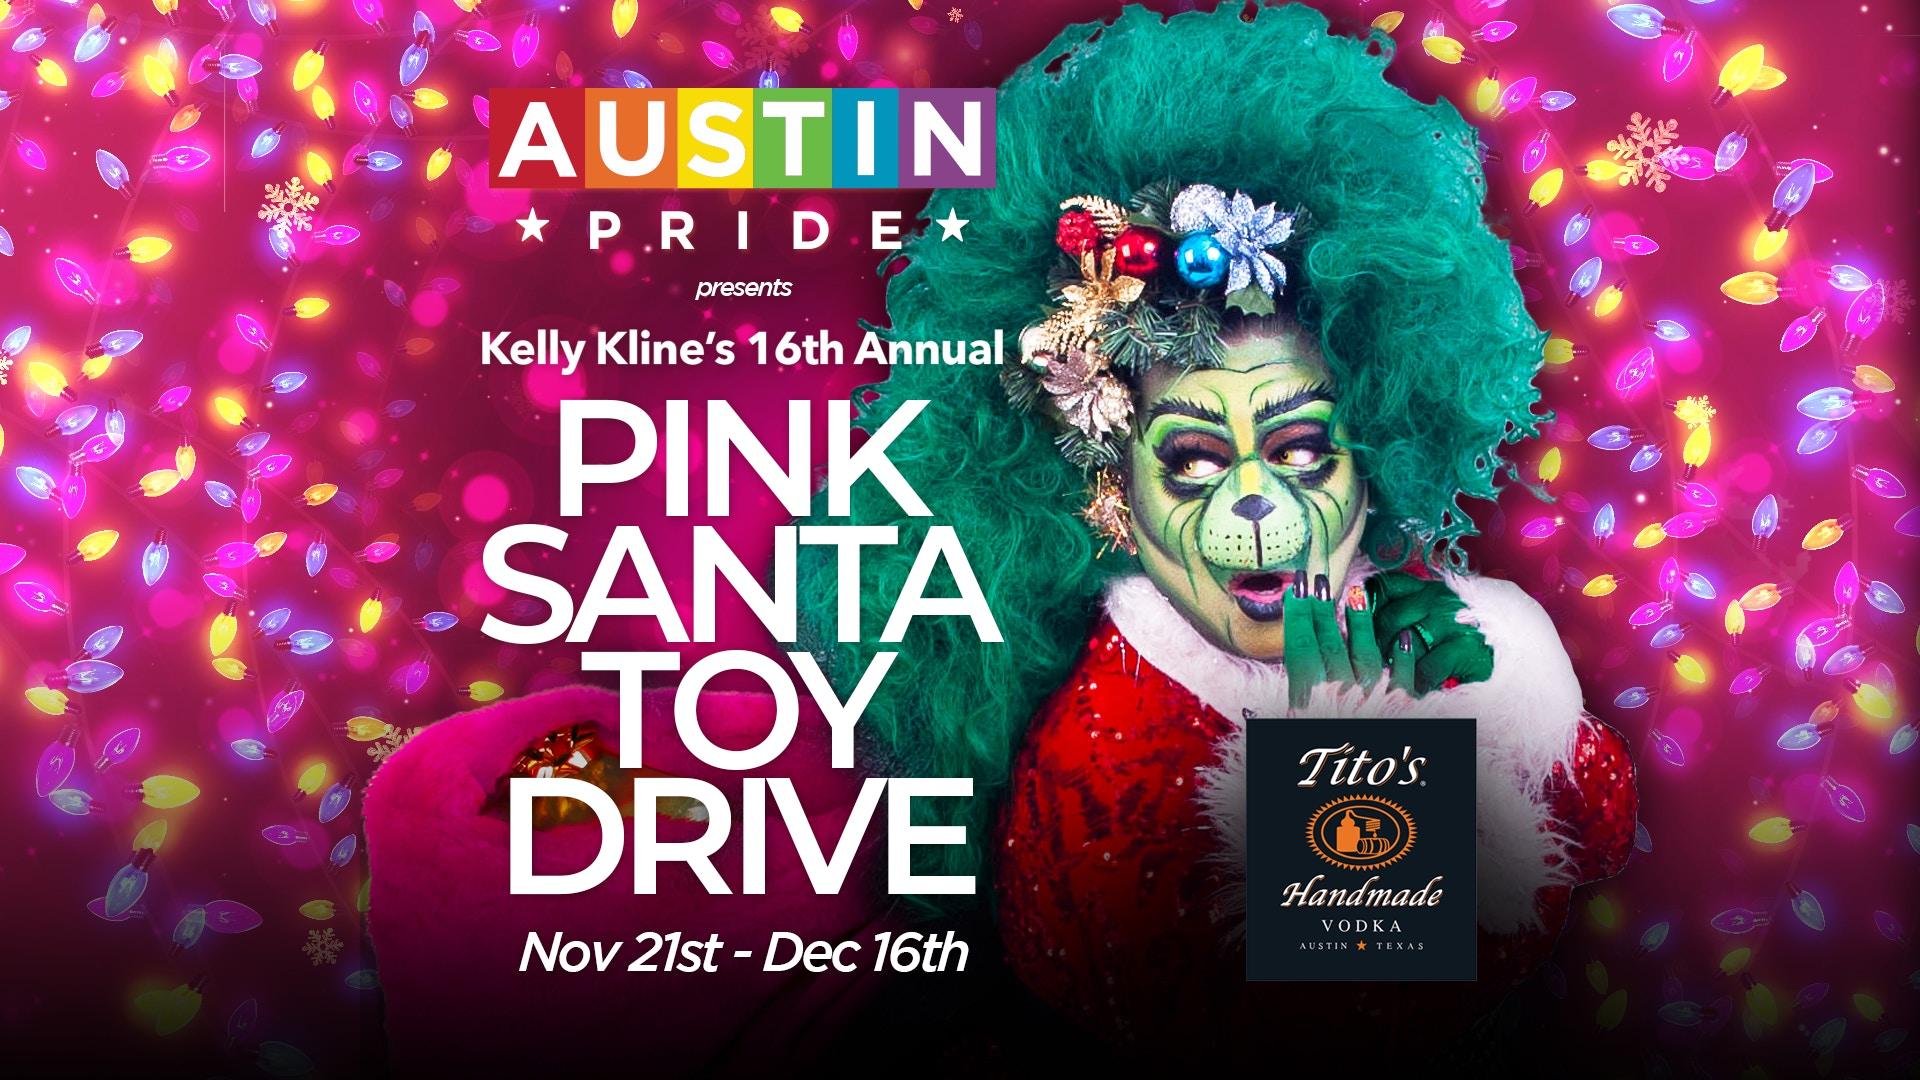 Austin Pride Presents: Kelly Kline's Pink Santa Toy Drive